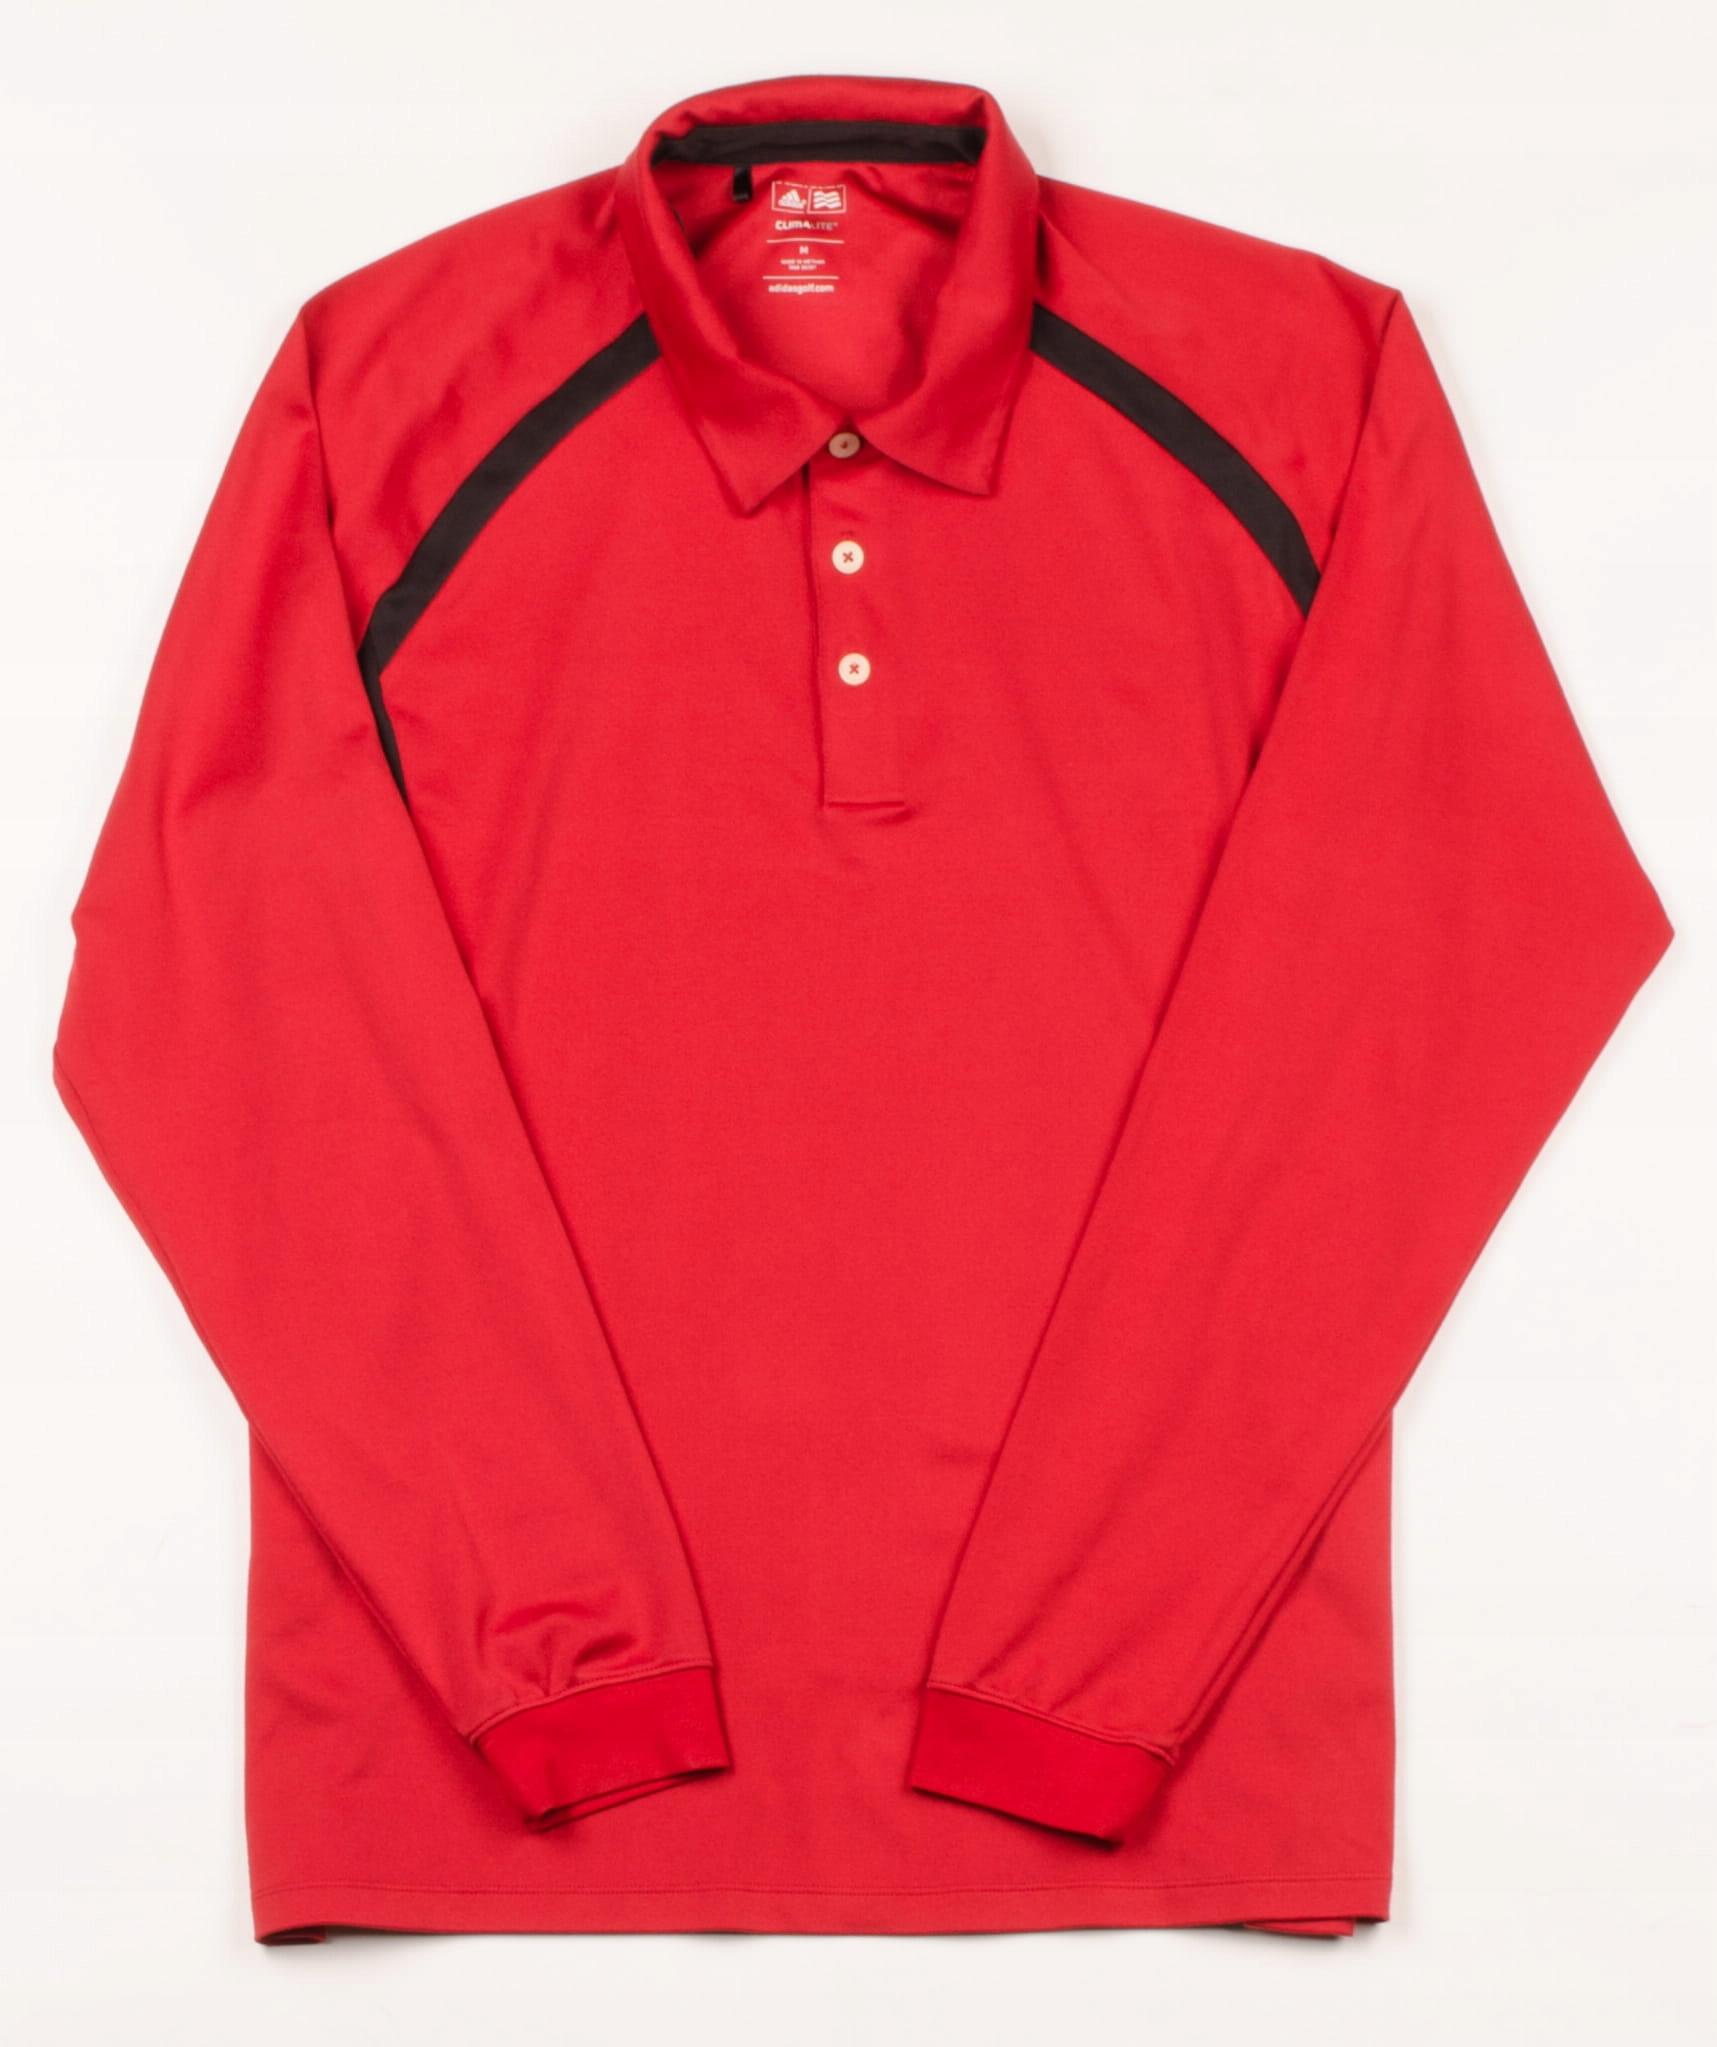 31409 Adidas Koszulka Sportowa Męska M